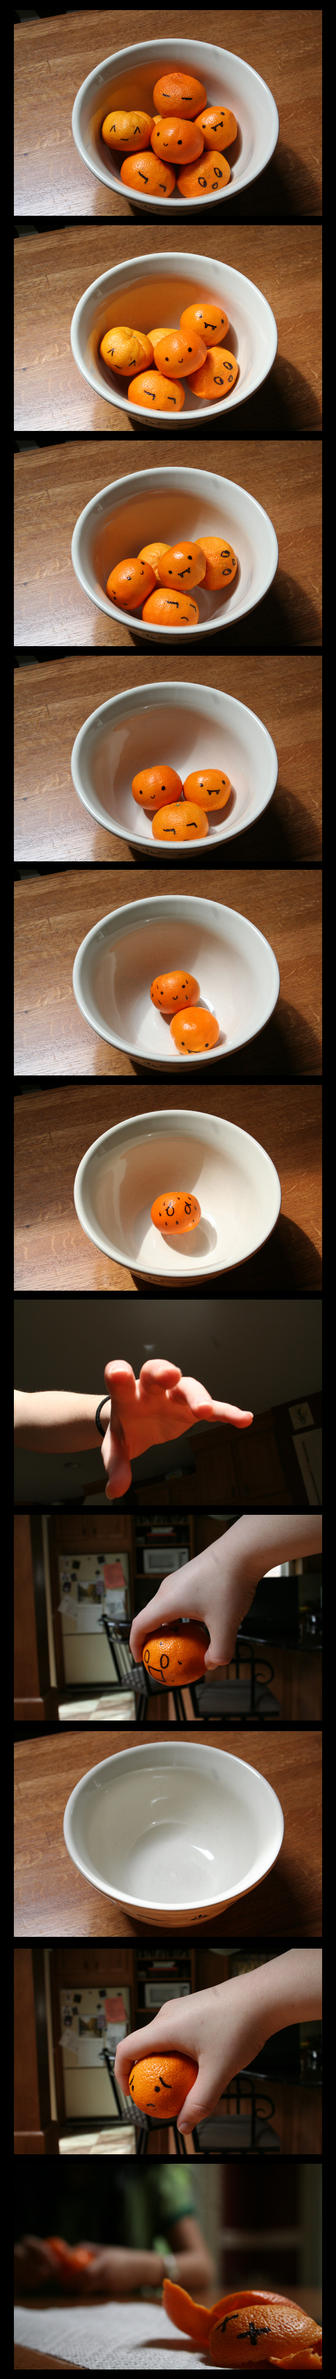 An Orange-y Demise by famel